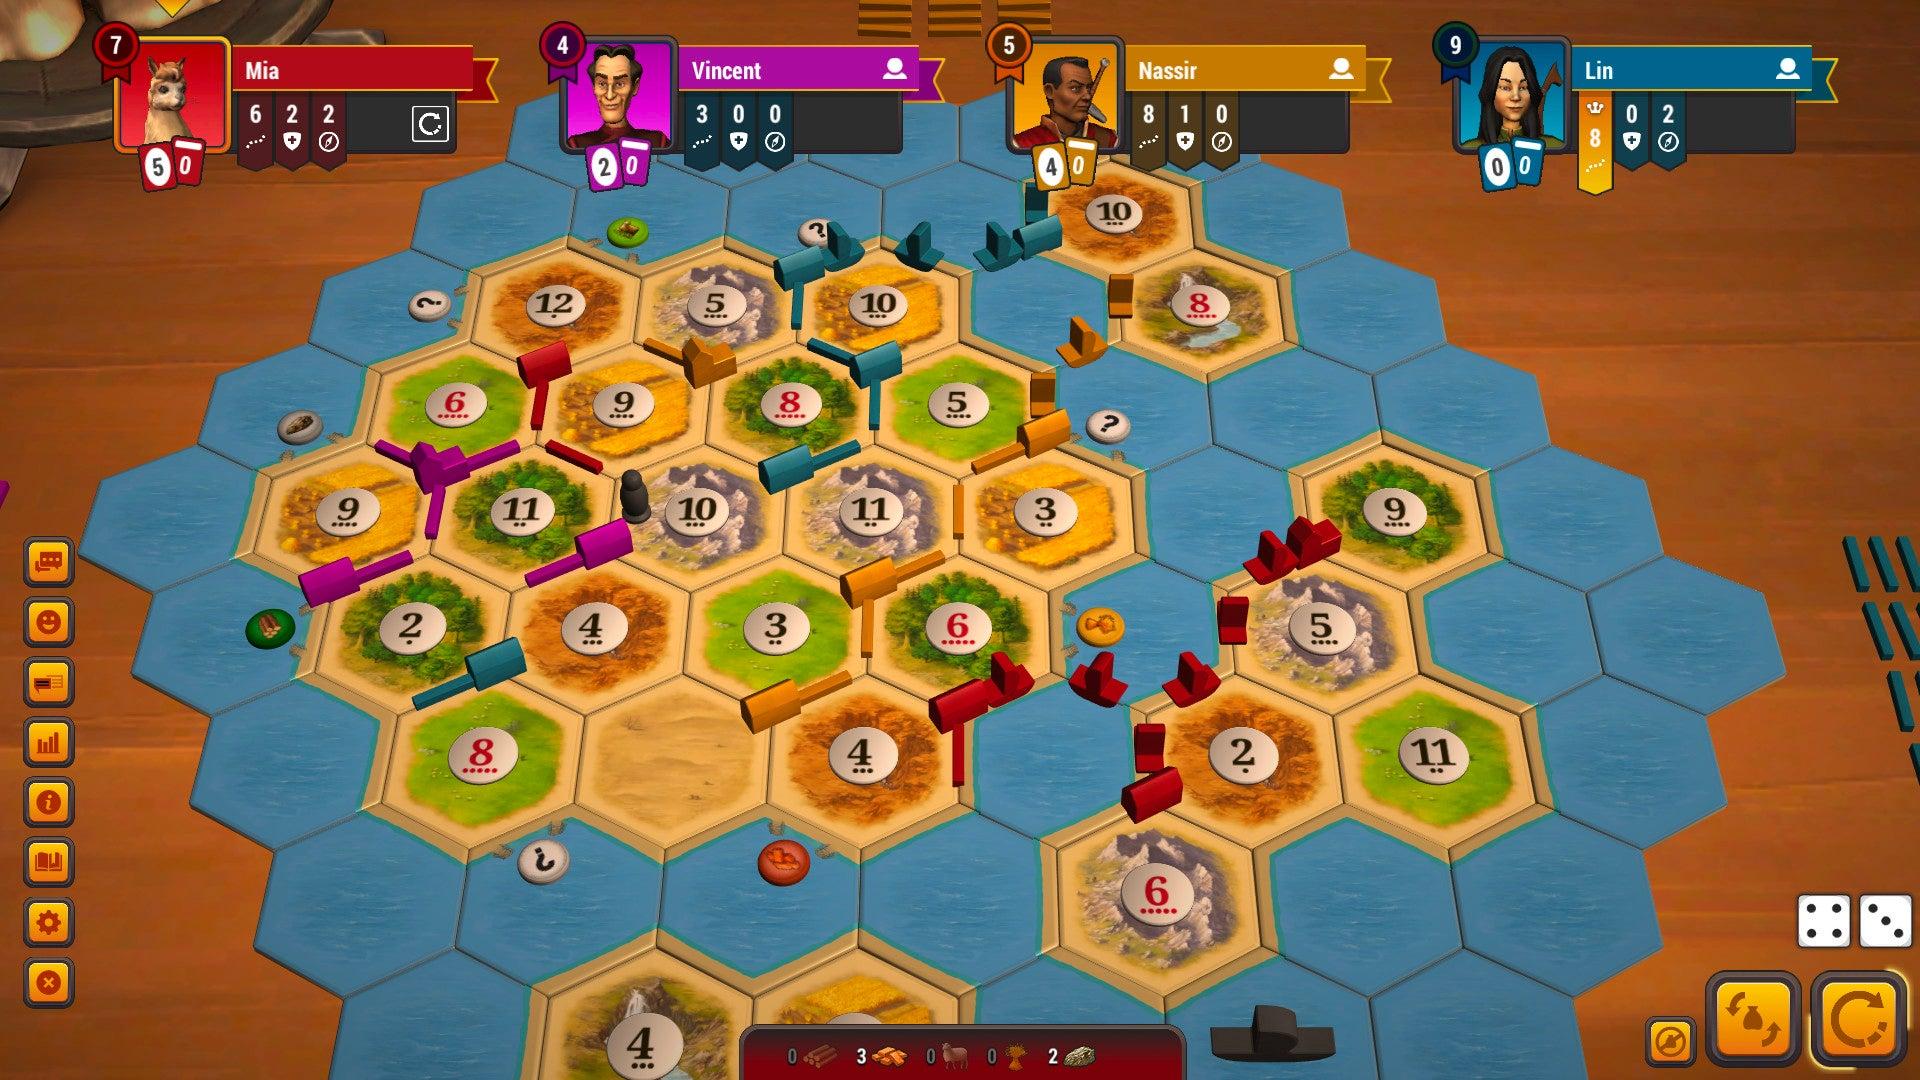 catan-universe-online-board-game.jpg